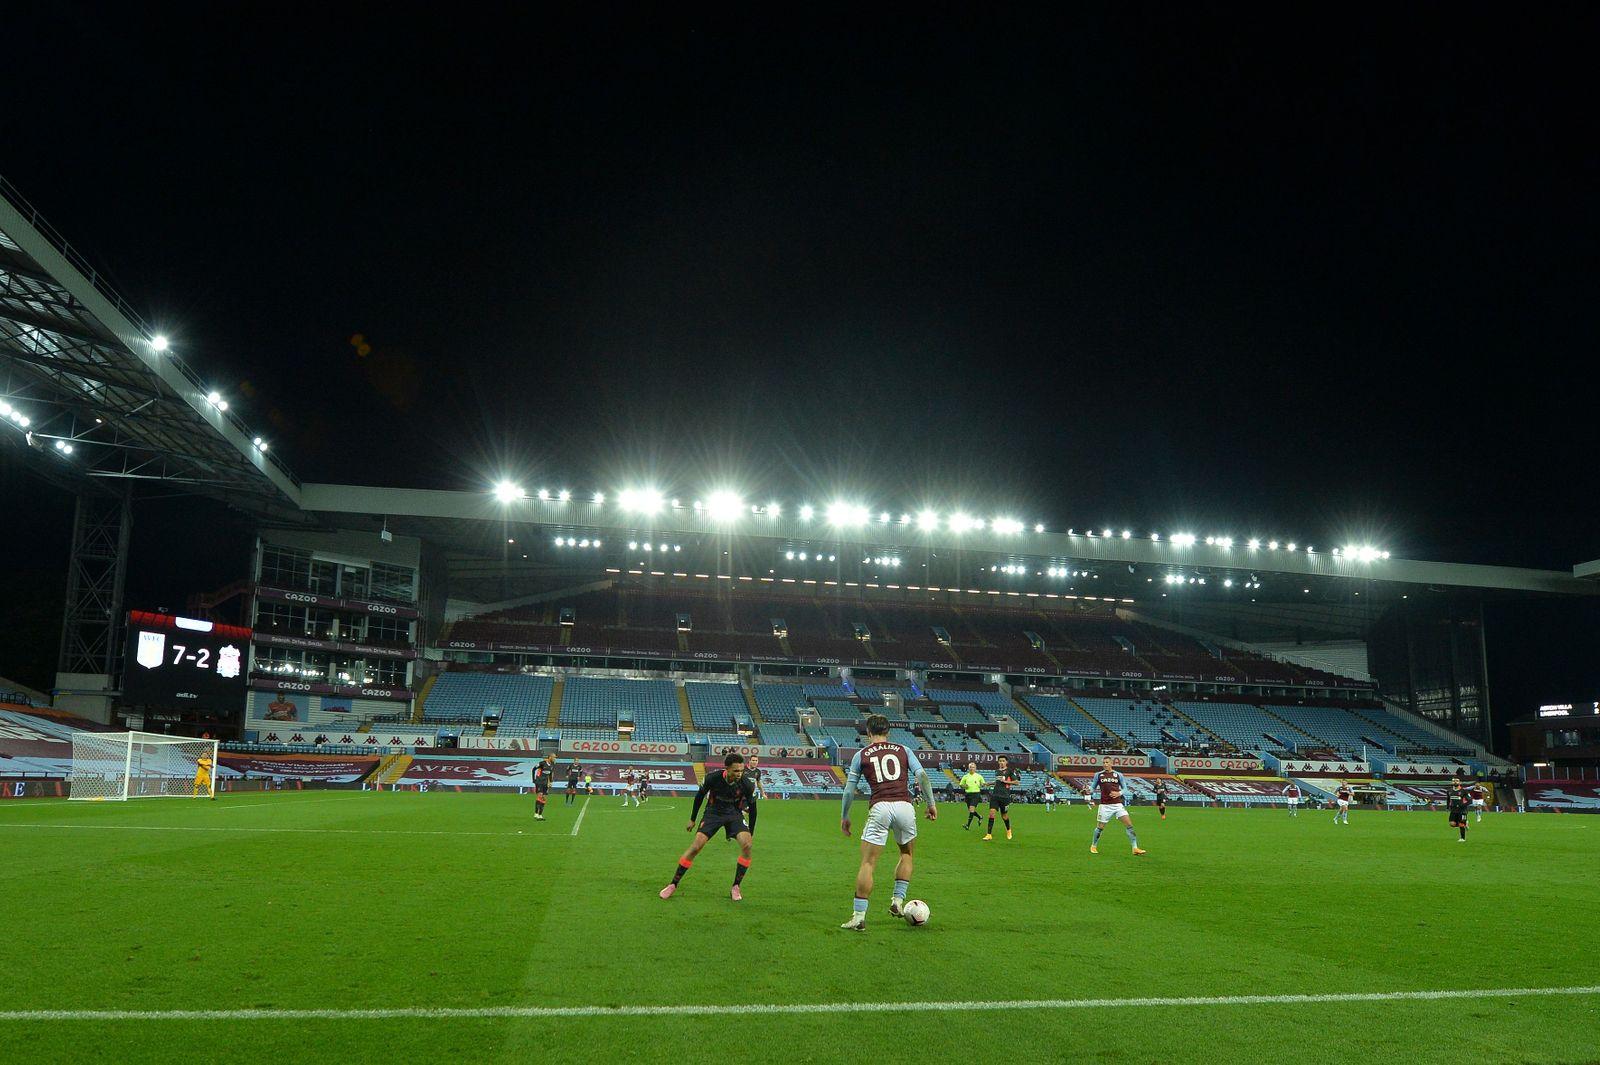 Aston Villa vs Liverpool, Birmingham, United Kingdom - 04 Oct 2020